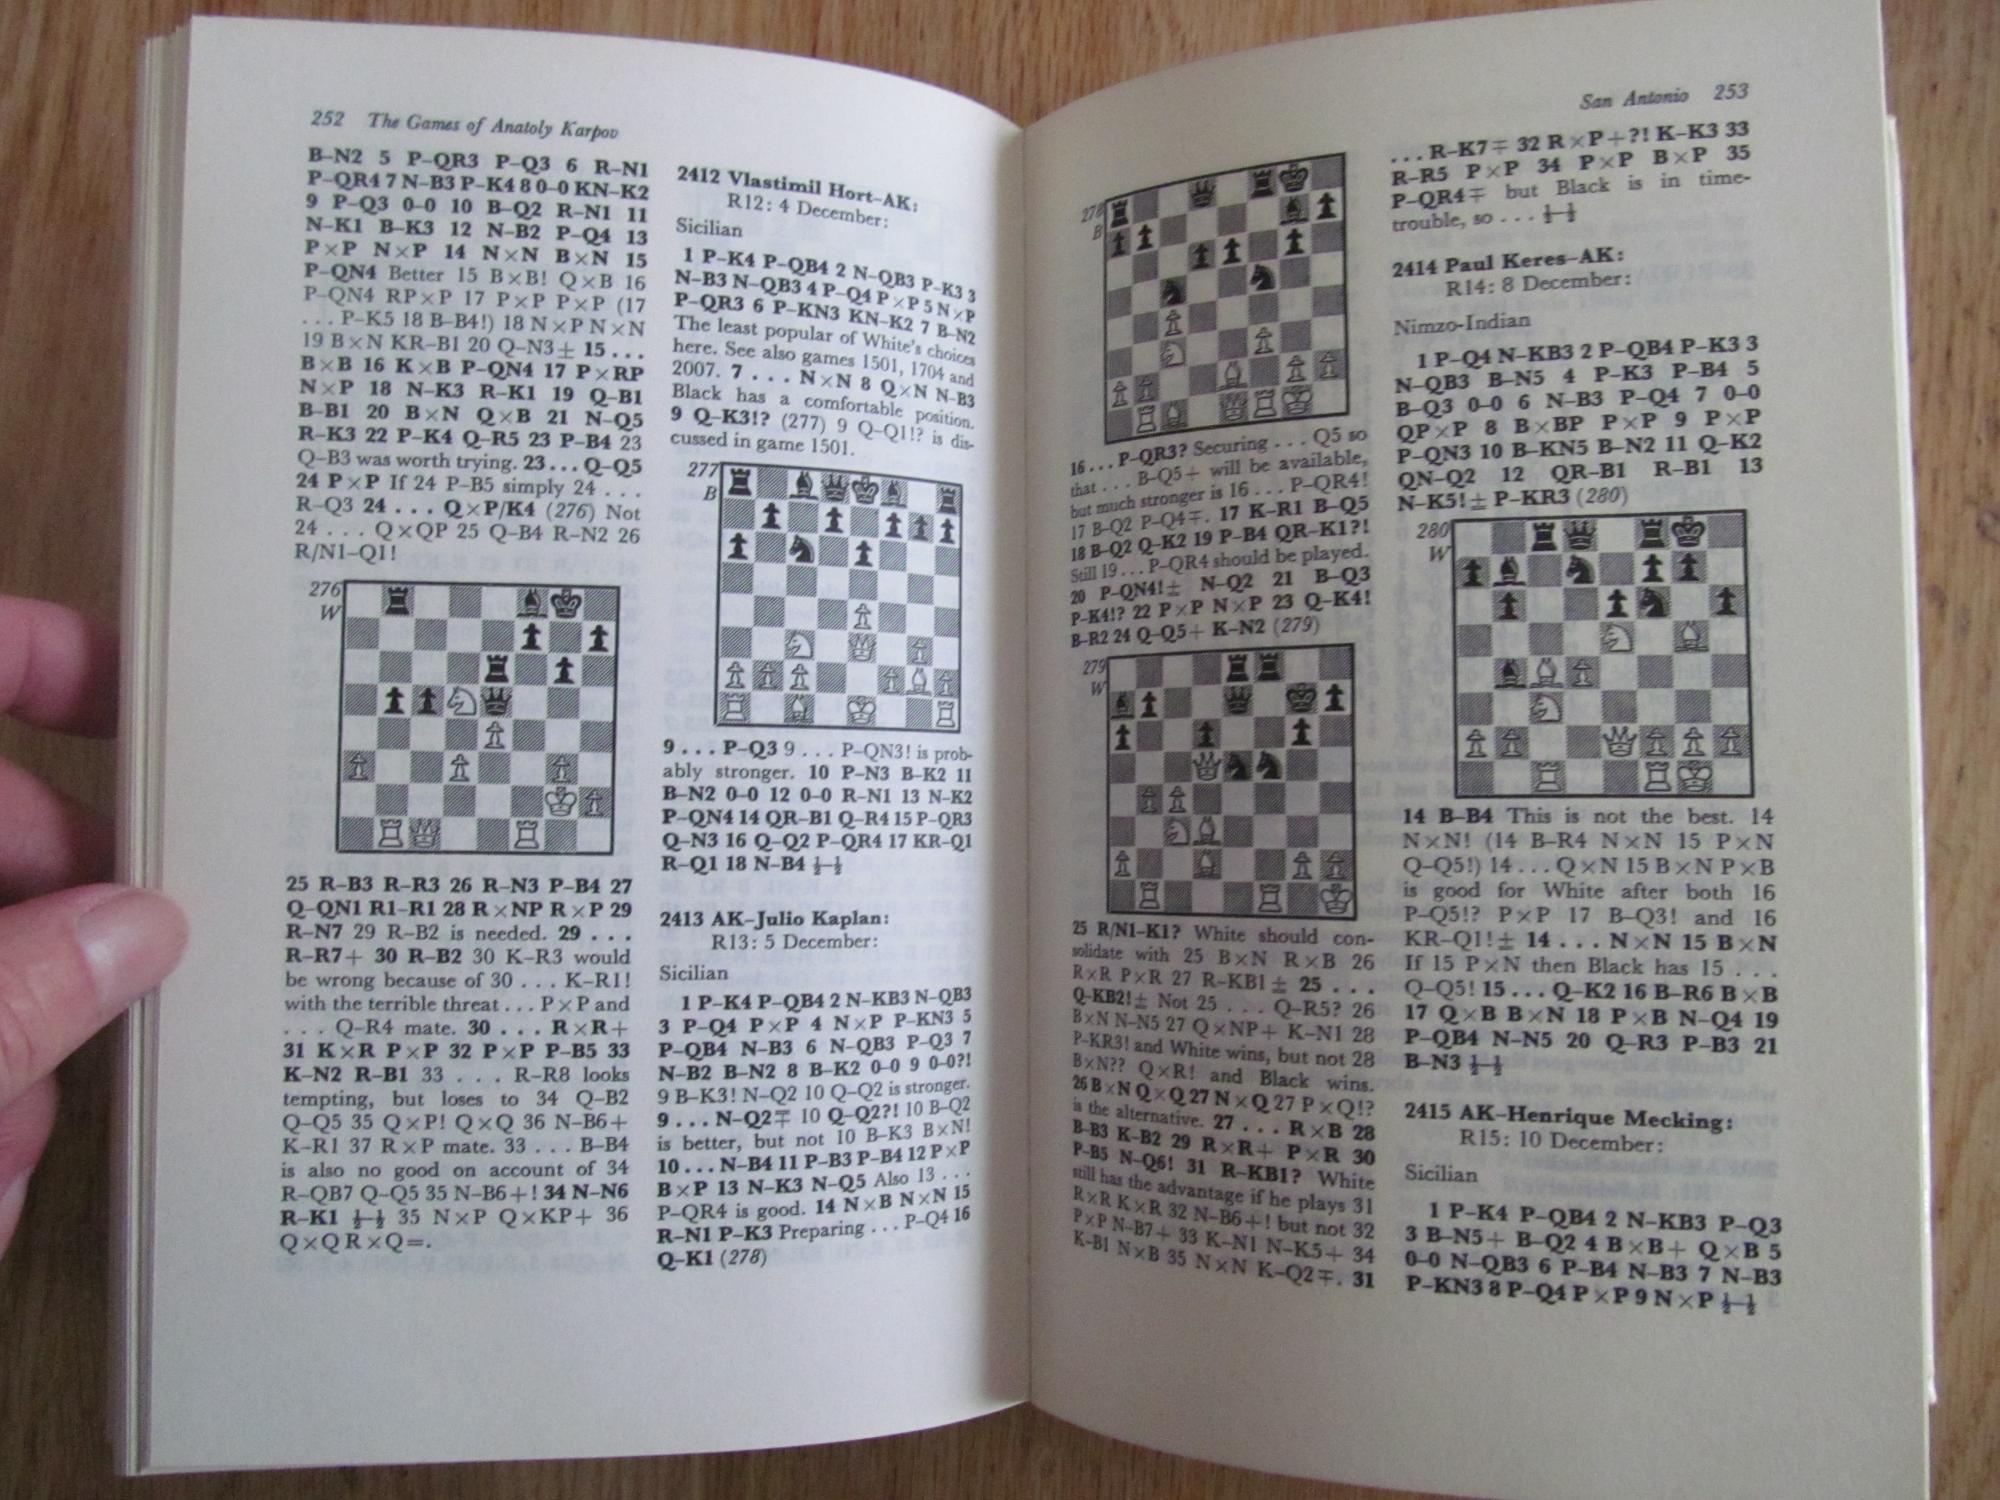 The games of Anatoly Karpov